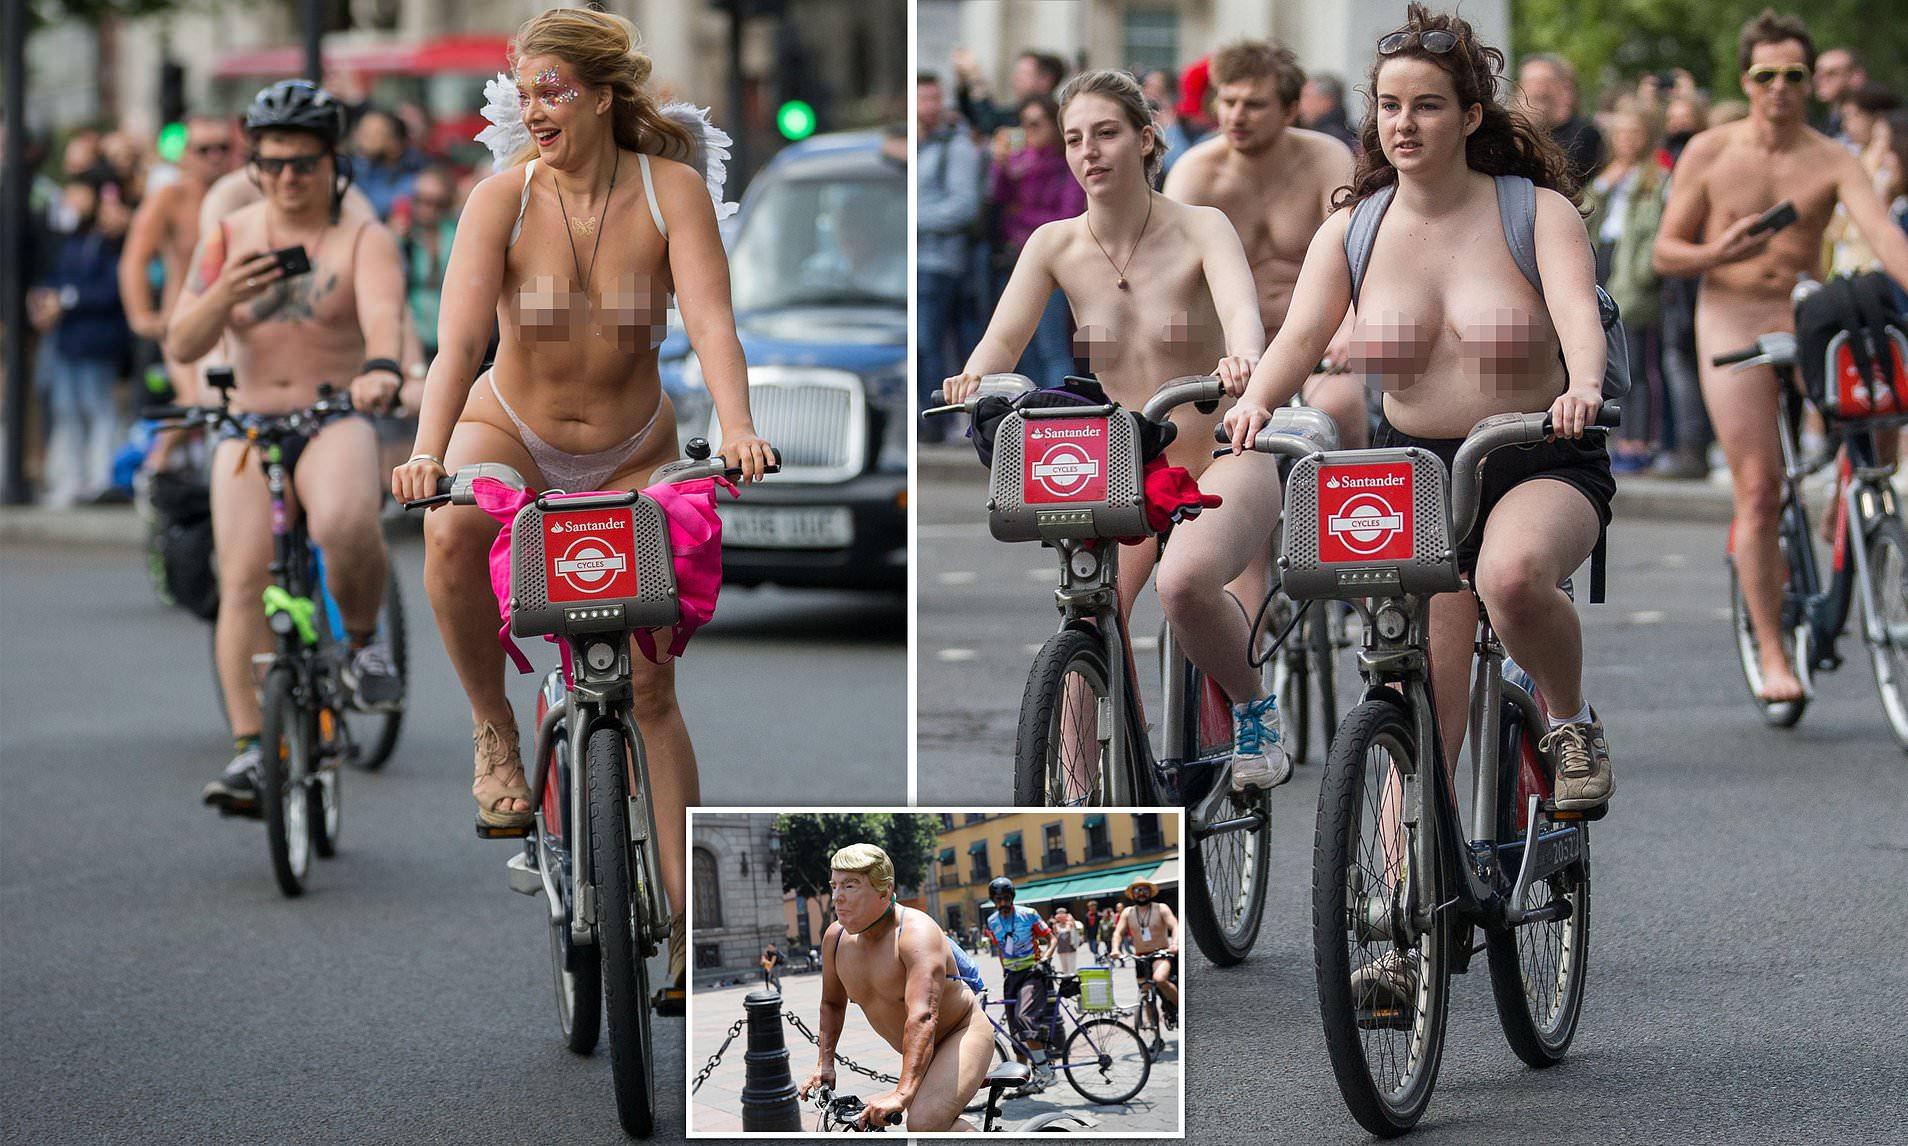 World naked bike ride women